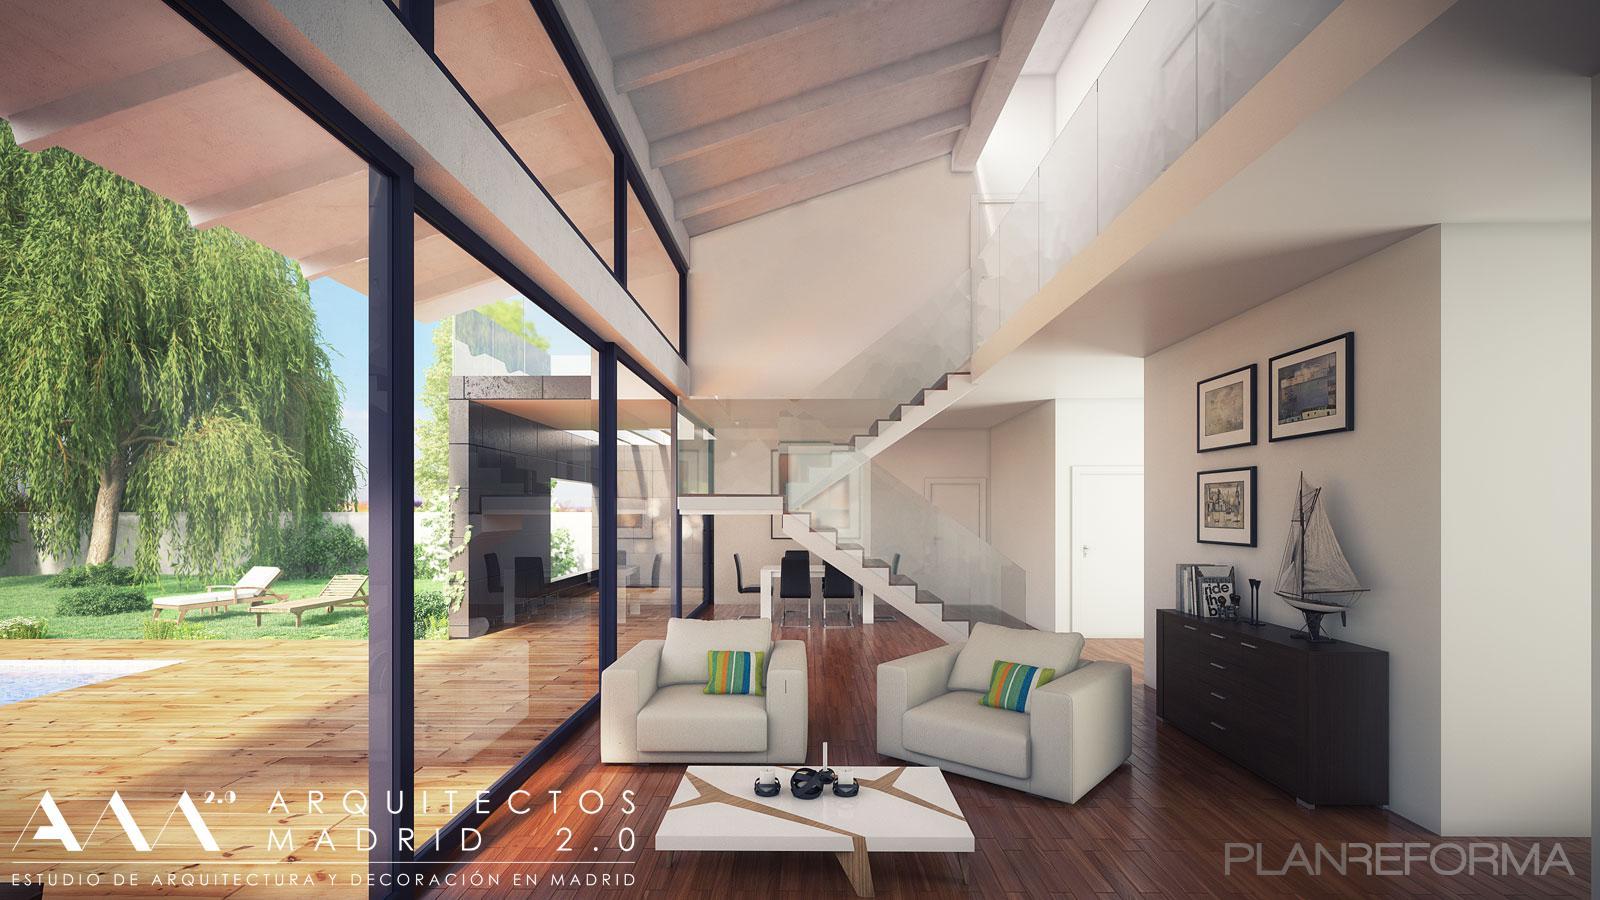 Exterior jardin loft style moderno color marron blanco for Loft modernos exterior